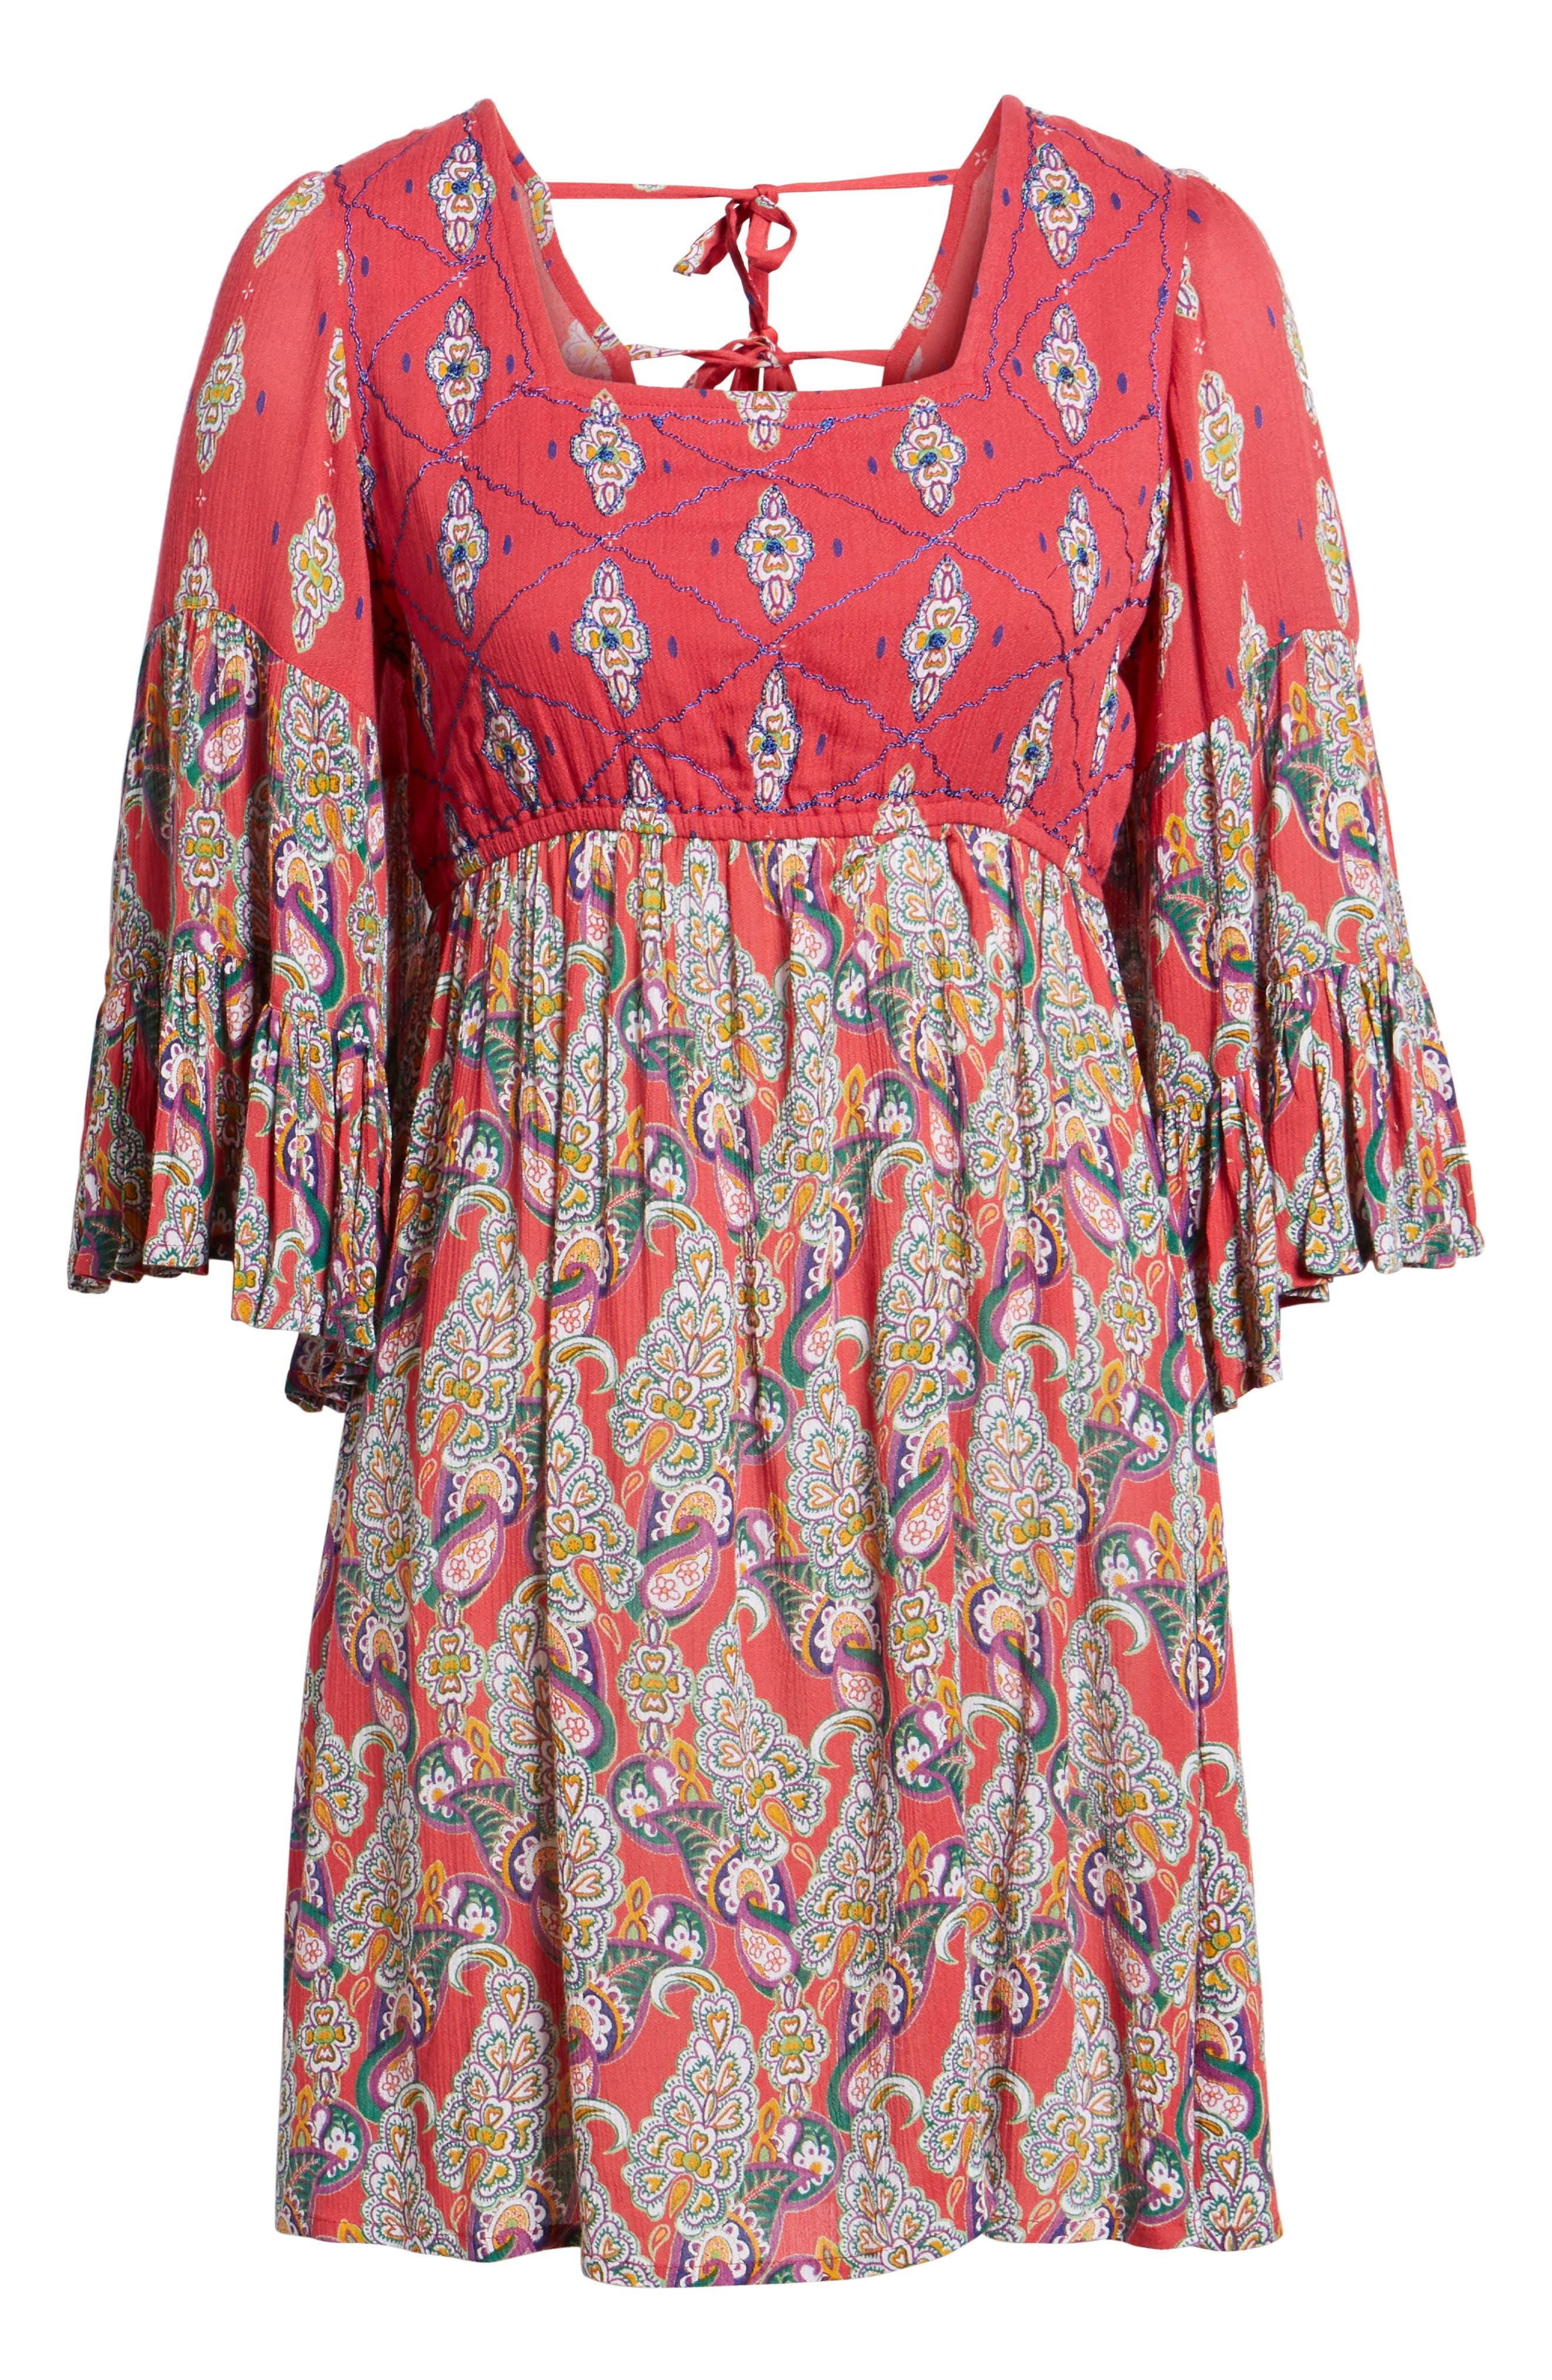 Alice Bell Sleeve Babydoll Dress,                             Alternate thumbnail 6, color,                             645